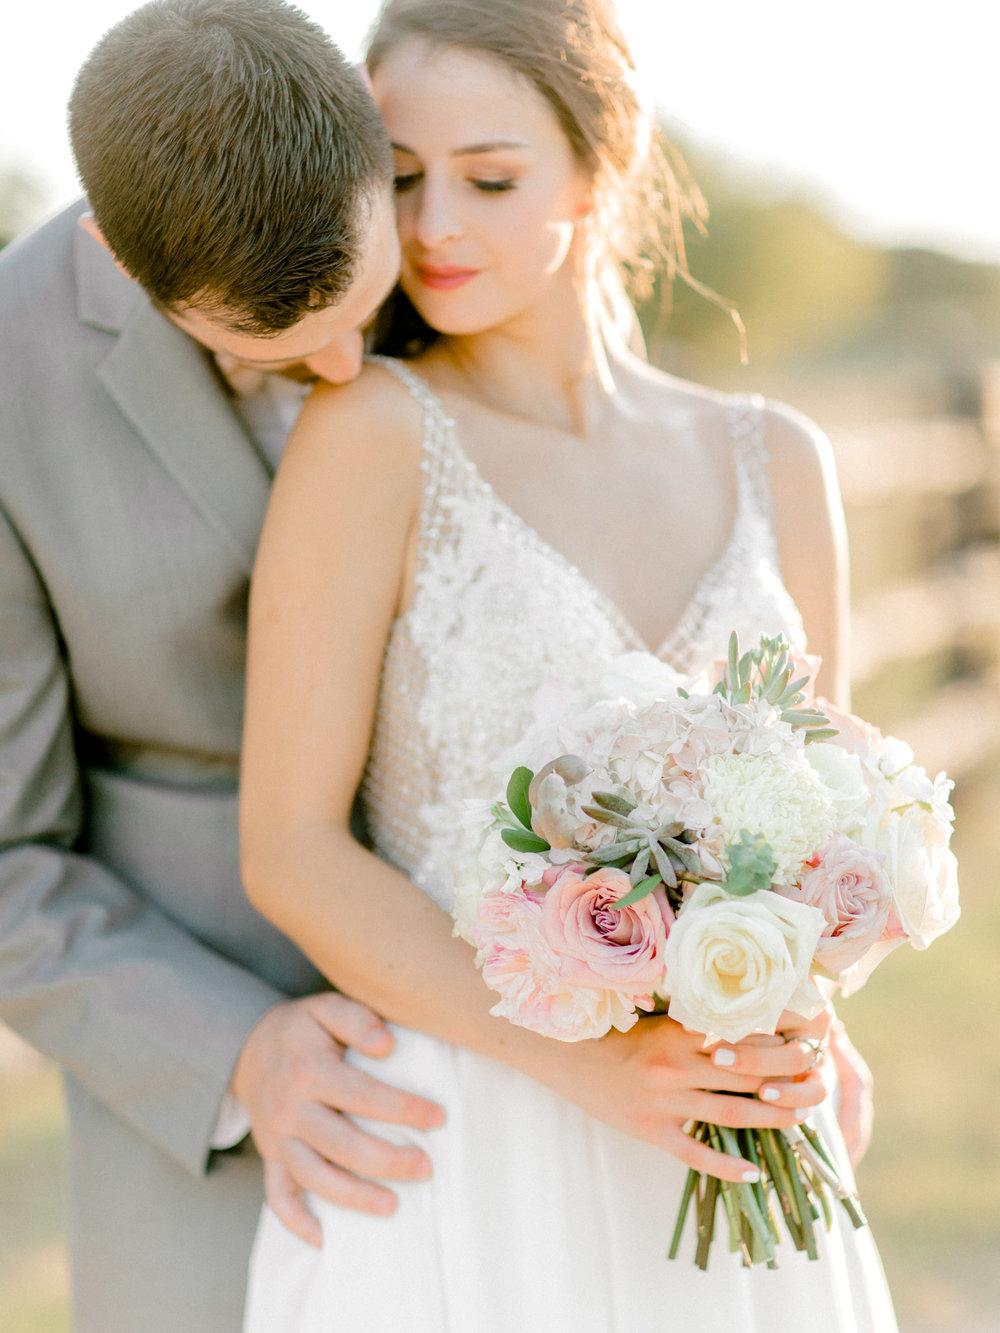 Honey Hollow Ranch Wedding Photos - Natural Light Photography